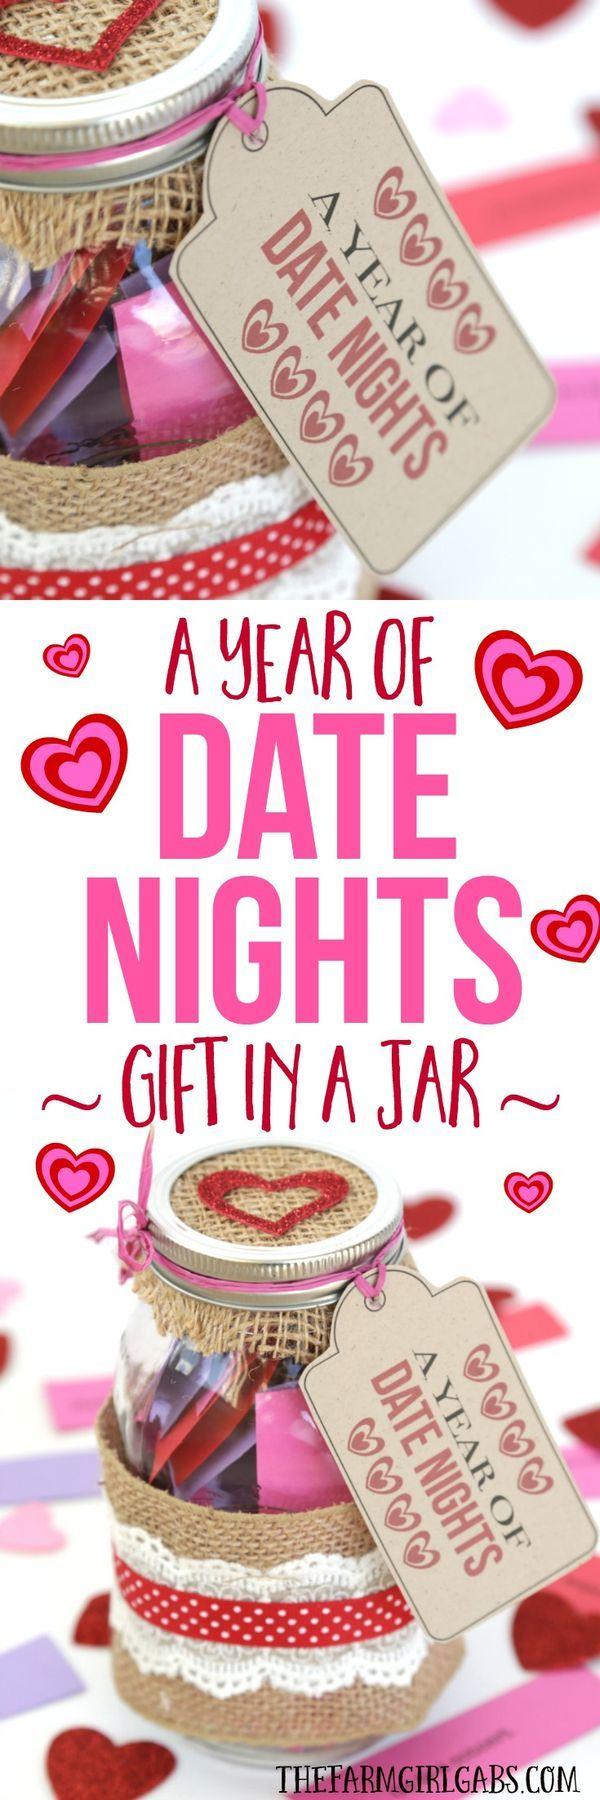 Fun ideas for dates in Melbourne